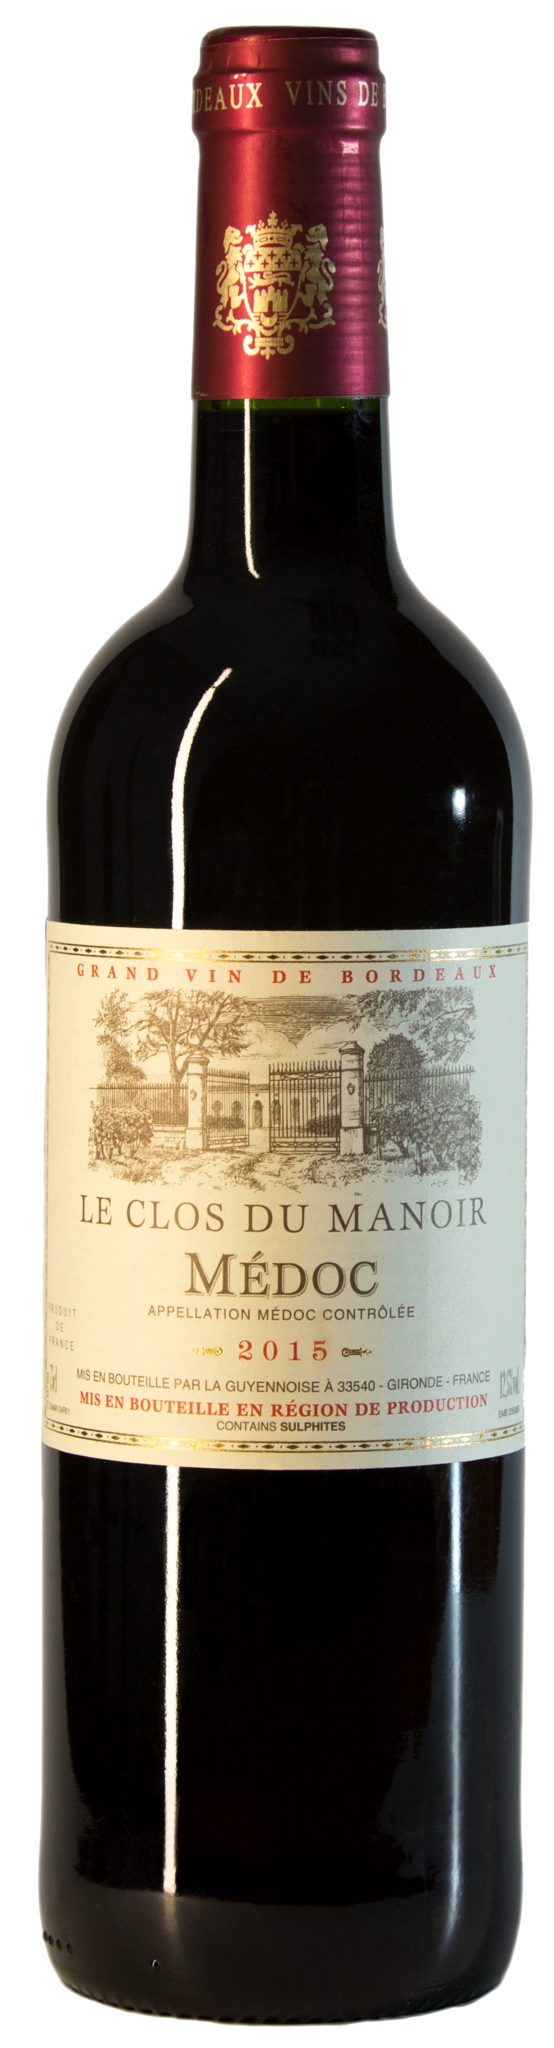 Le Clos du Manoir AOC Medoc